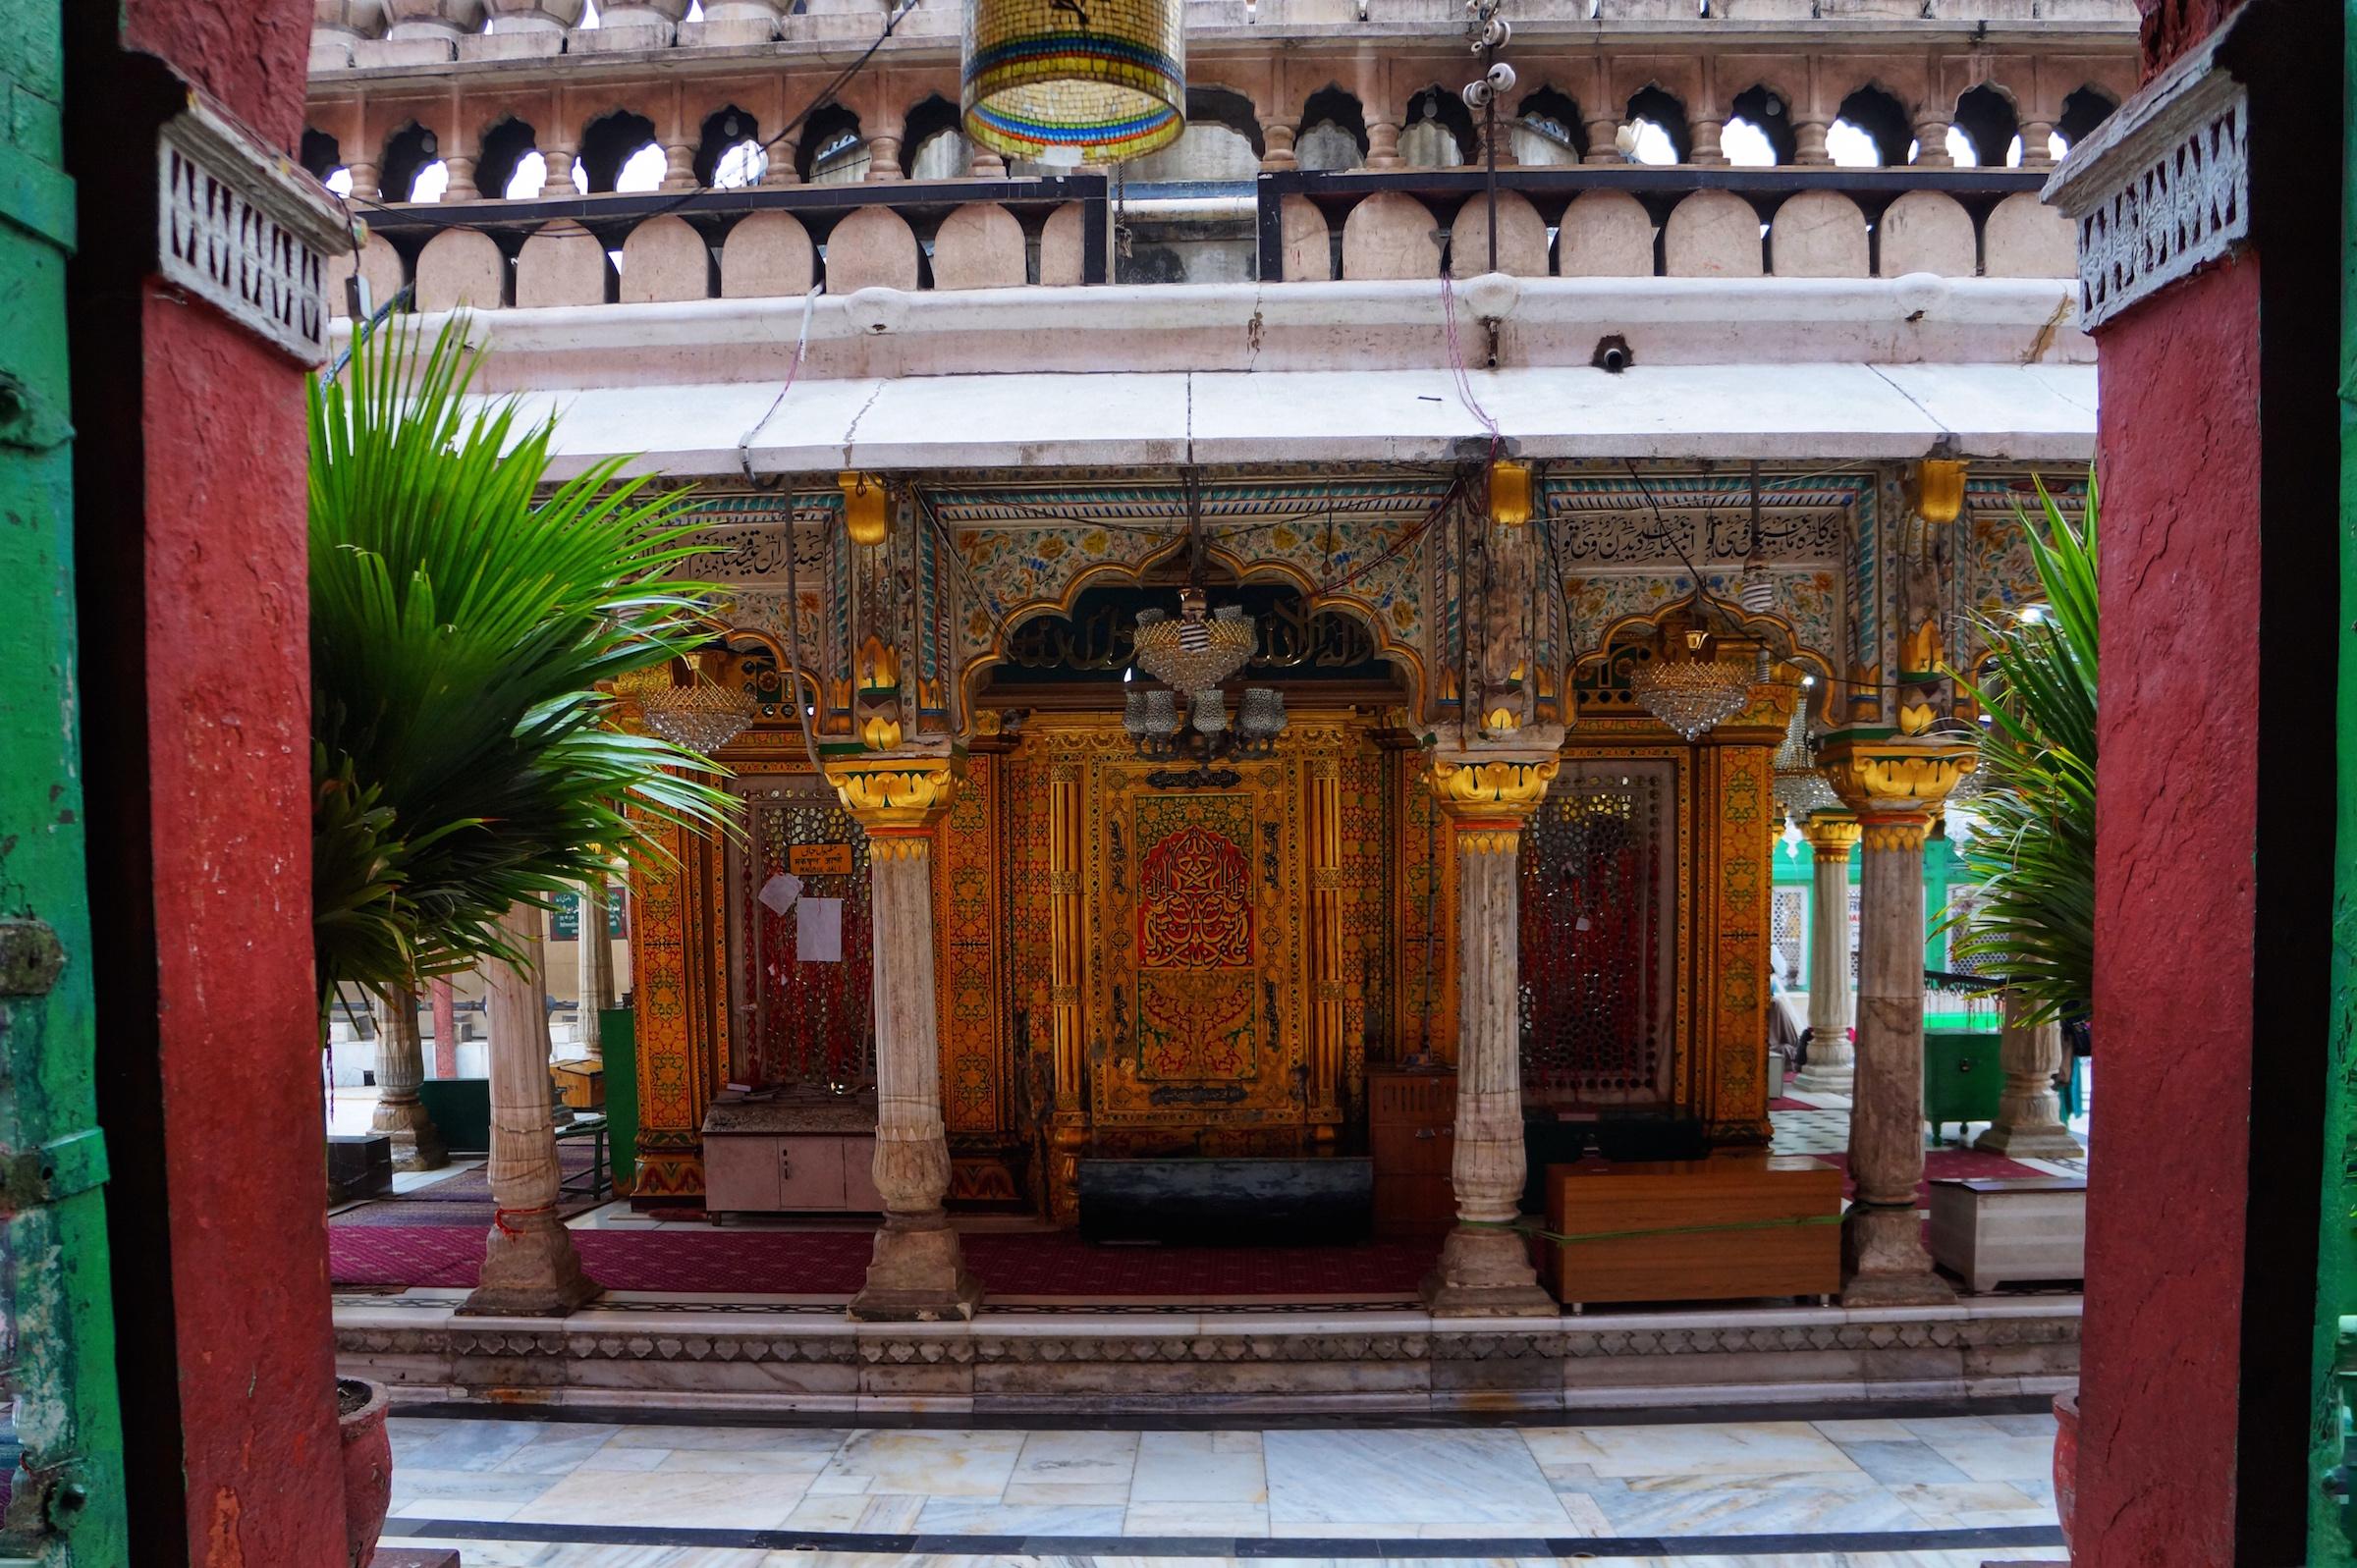 A view from within the Jama 'at-Khana-Masjid in Nizamuddin West, Delhi.